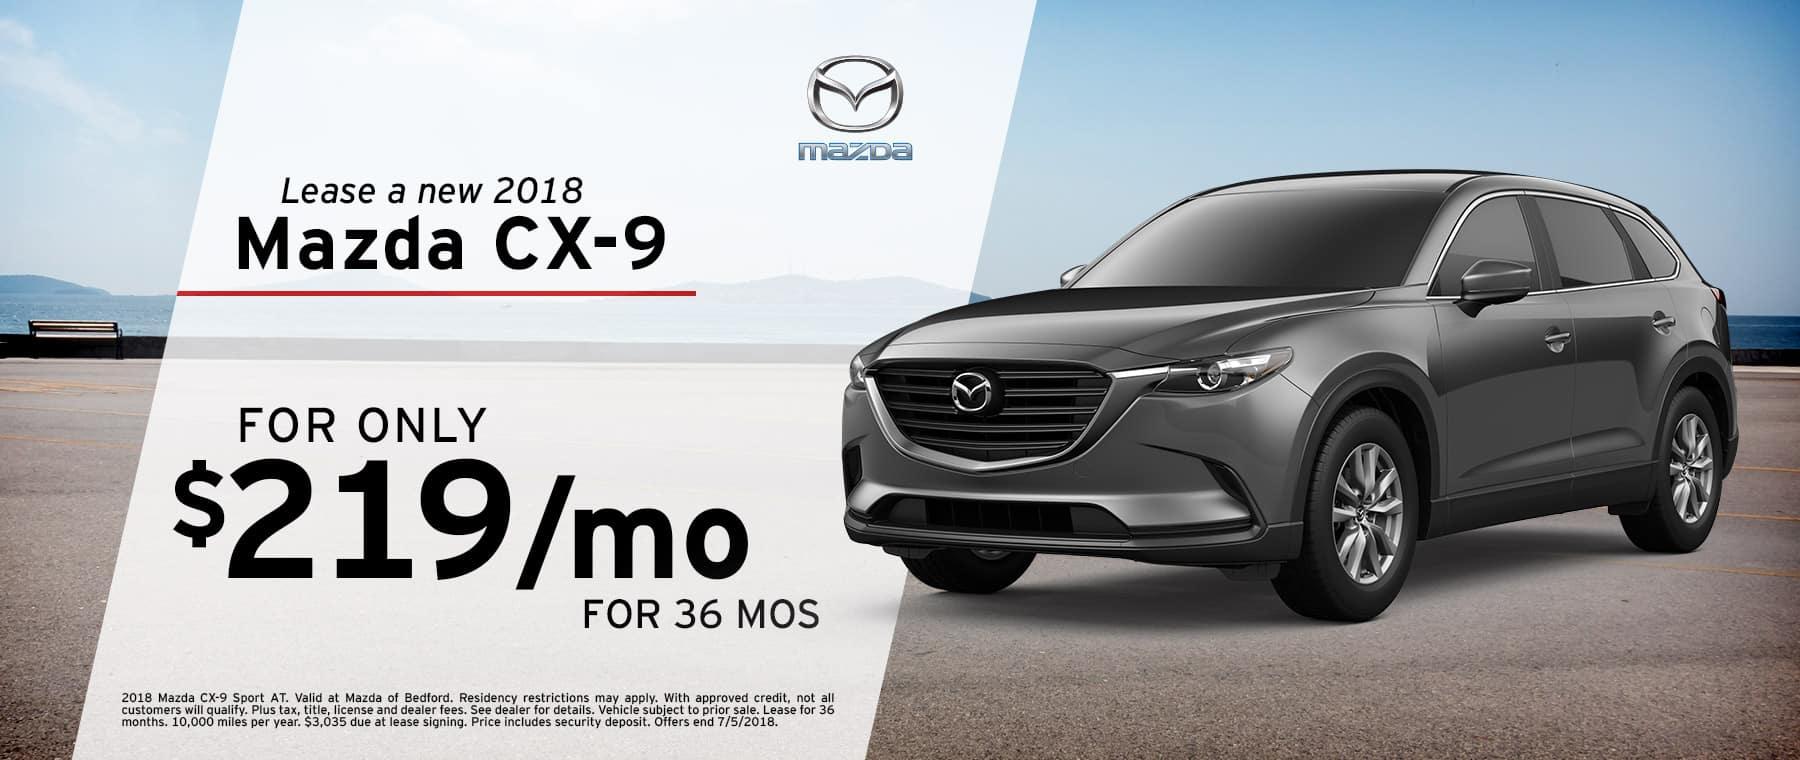 Mazda Bedford Specials | Mazda CX-9